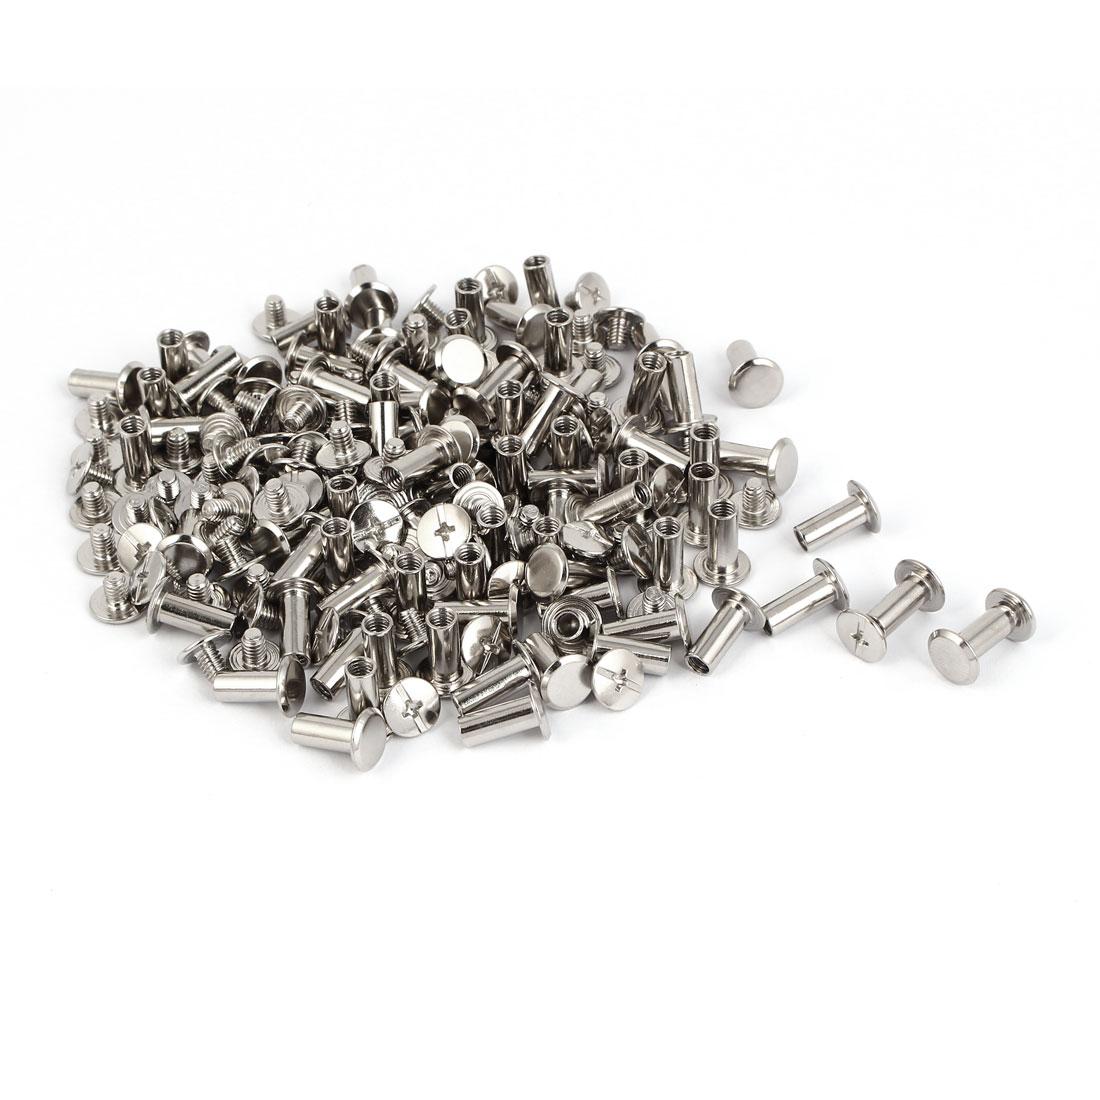 Purse Belts Photo Albums Metal Binding Chicago Screws Posts M5 x 12mm 100 Pcs